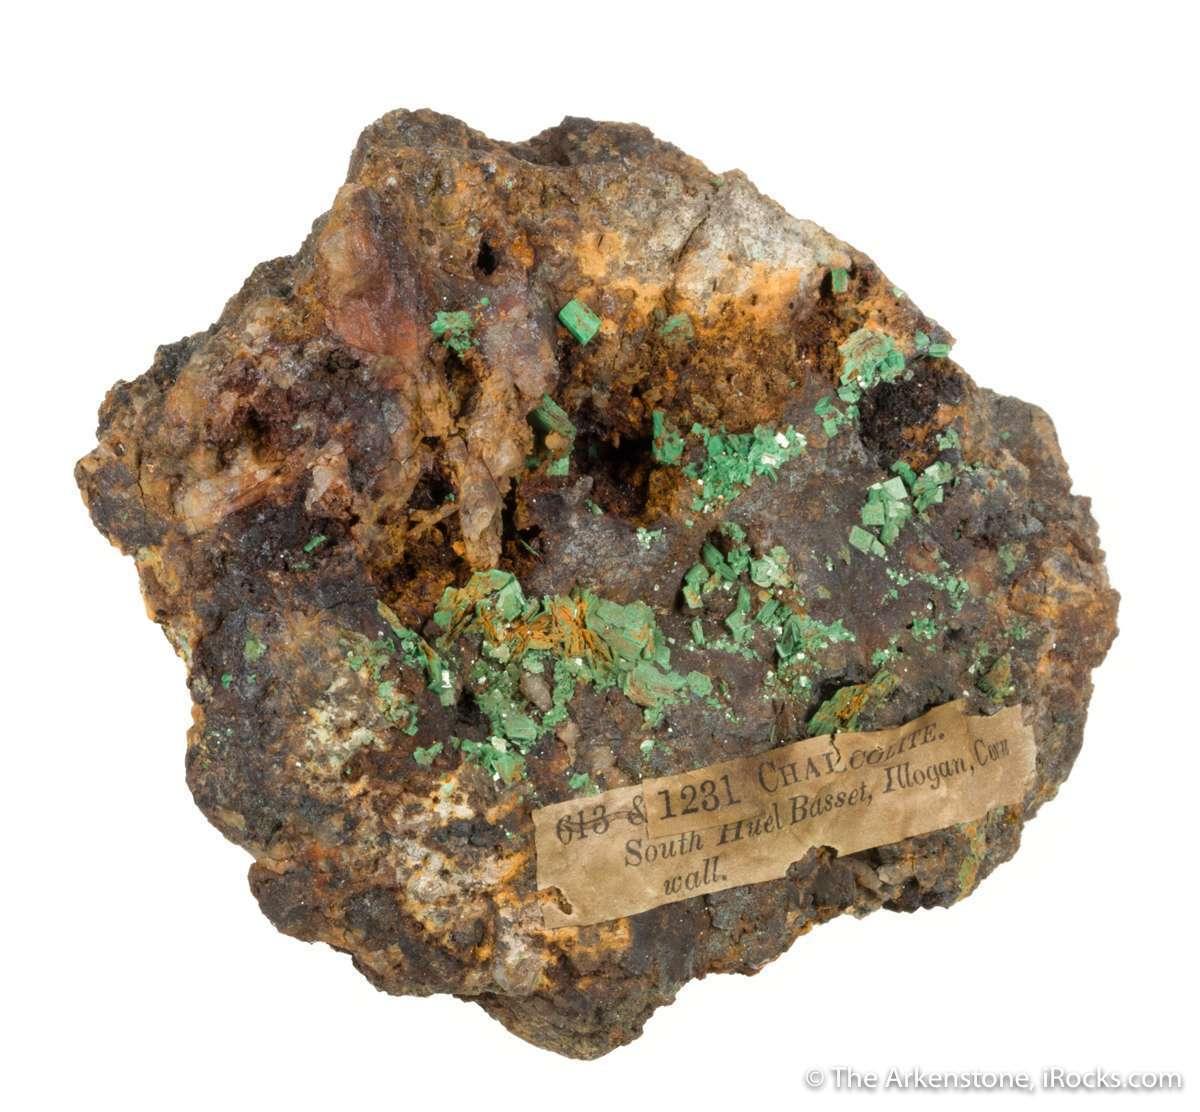 Tetragonal lustrous neon green crystals metatorbernite 5 mm emplaced